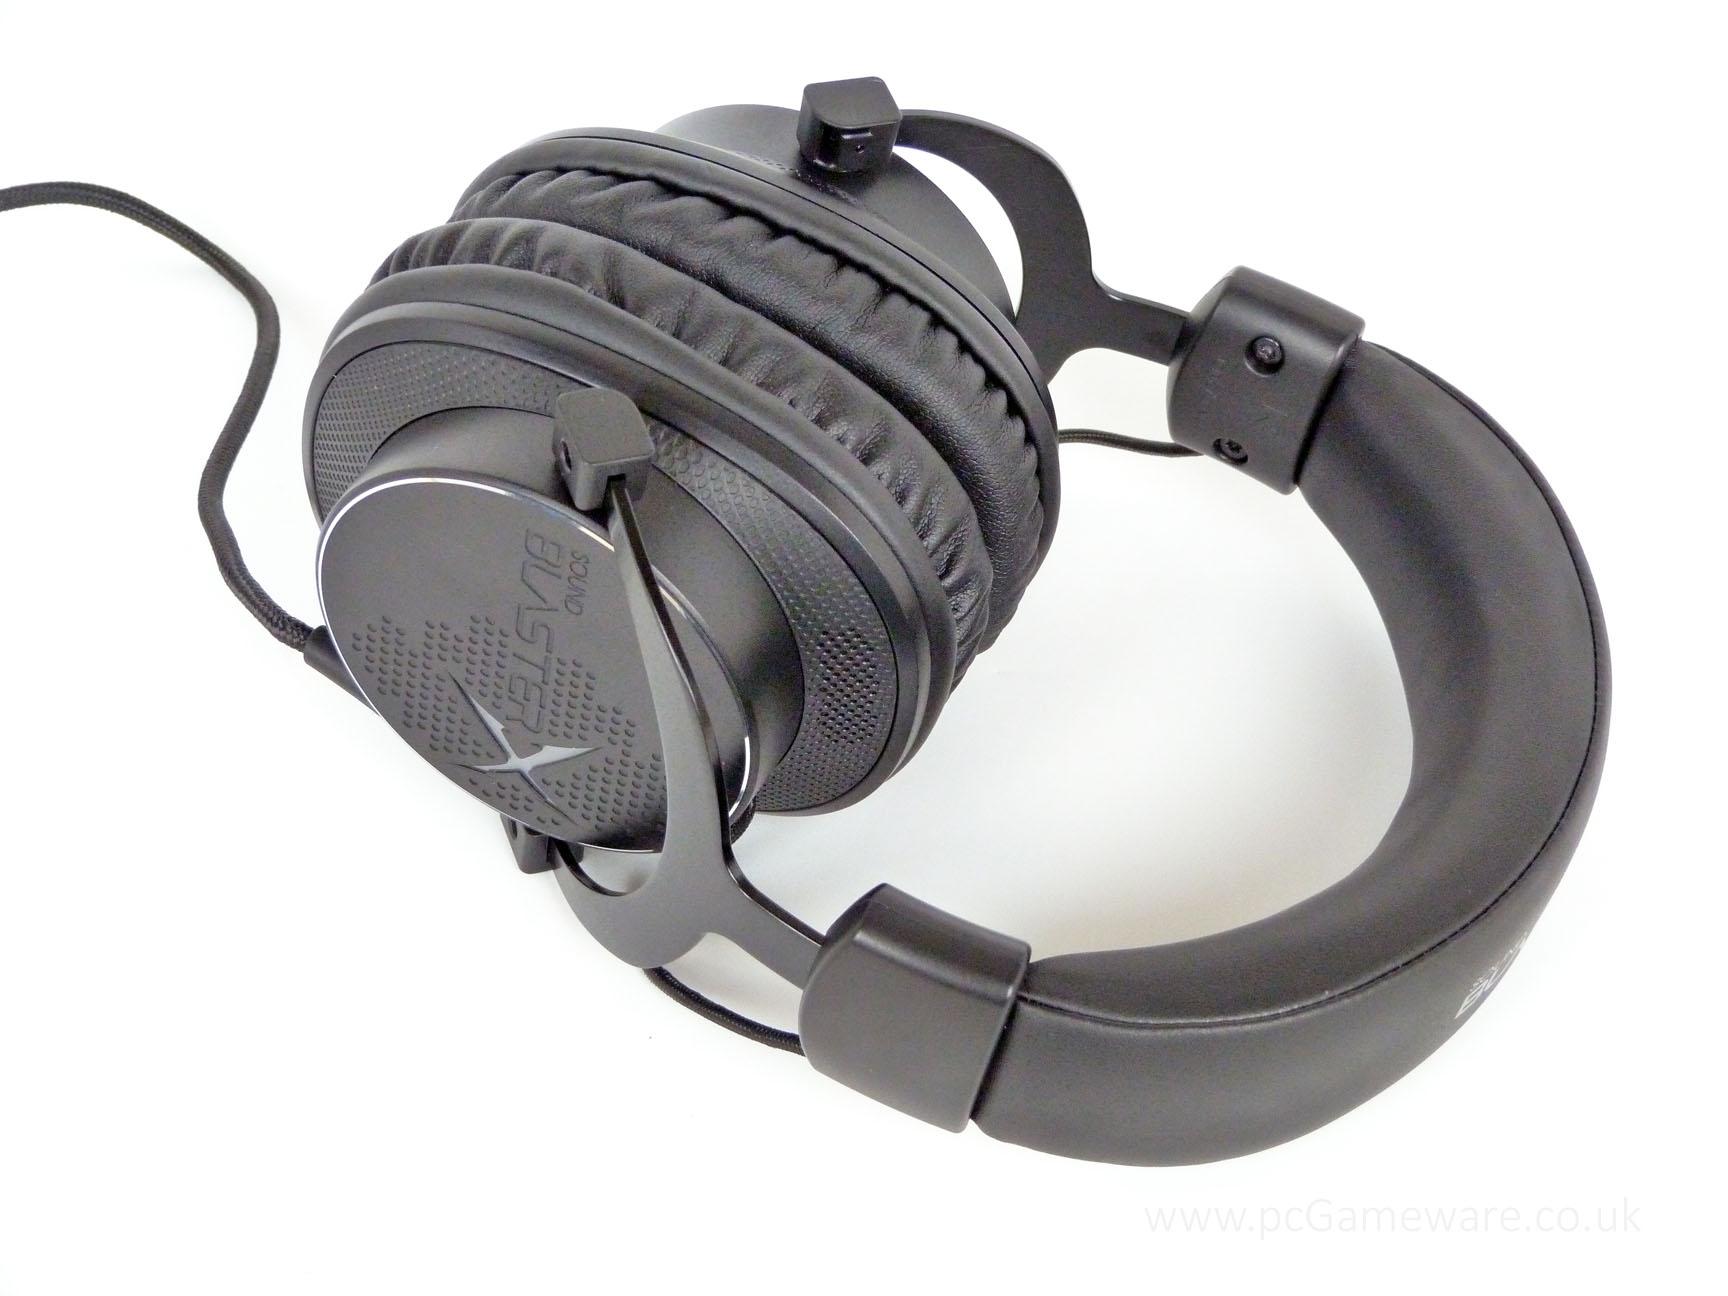 content 2016 09 The Kooks Bad Habit13 Logitech Wireless Gaming Headset G930